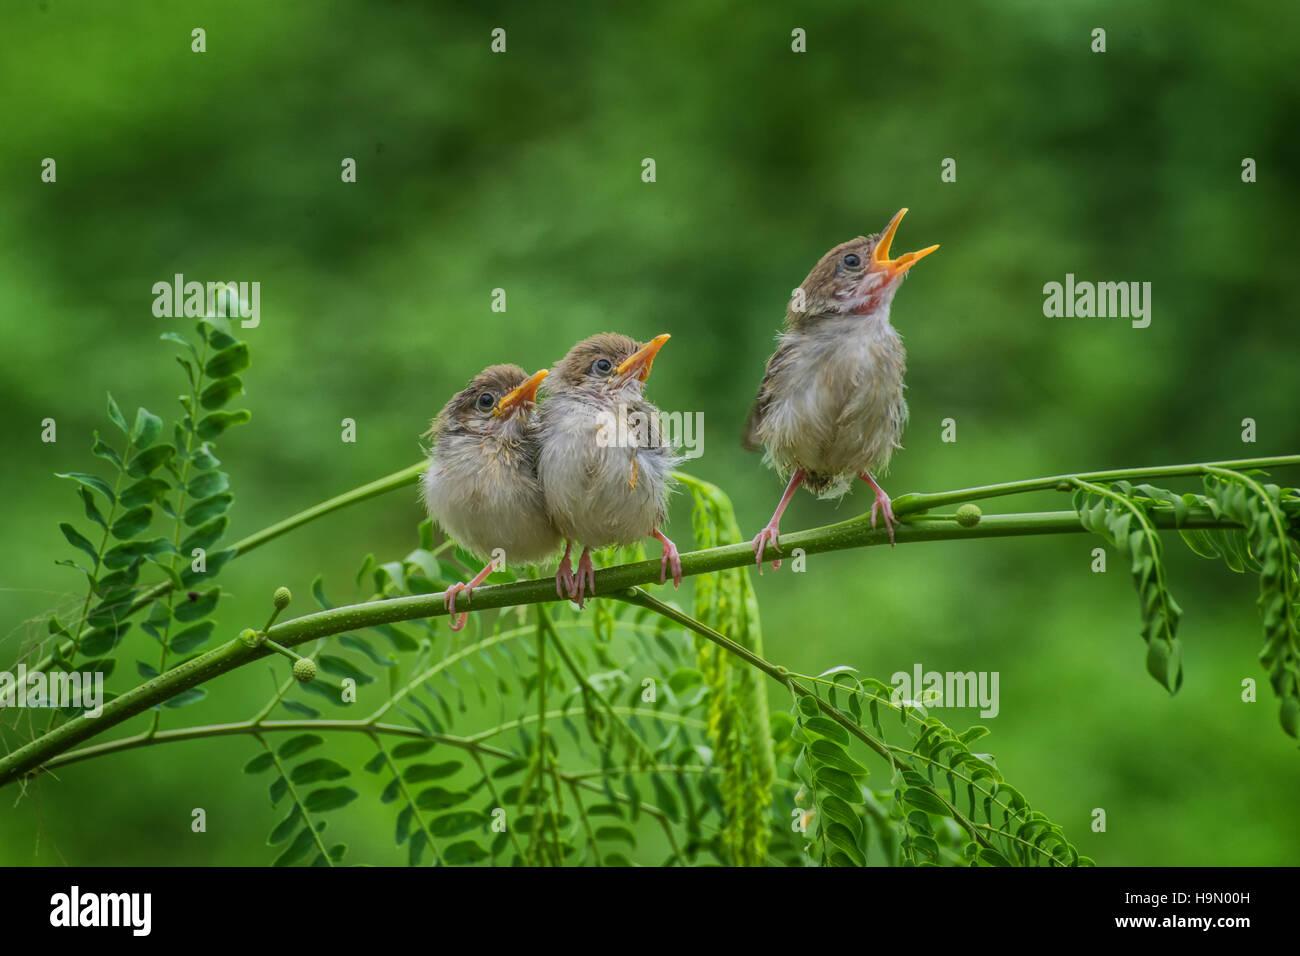 Singing bird stockfotos bilder alamy